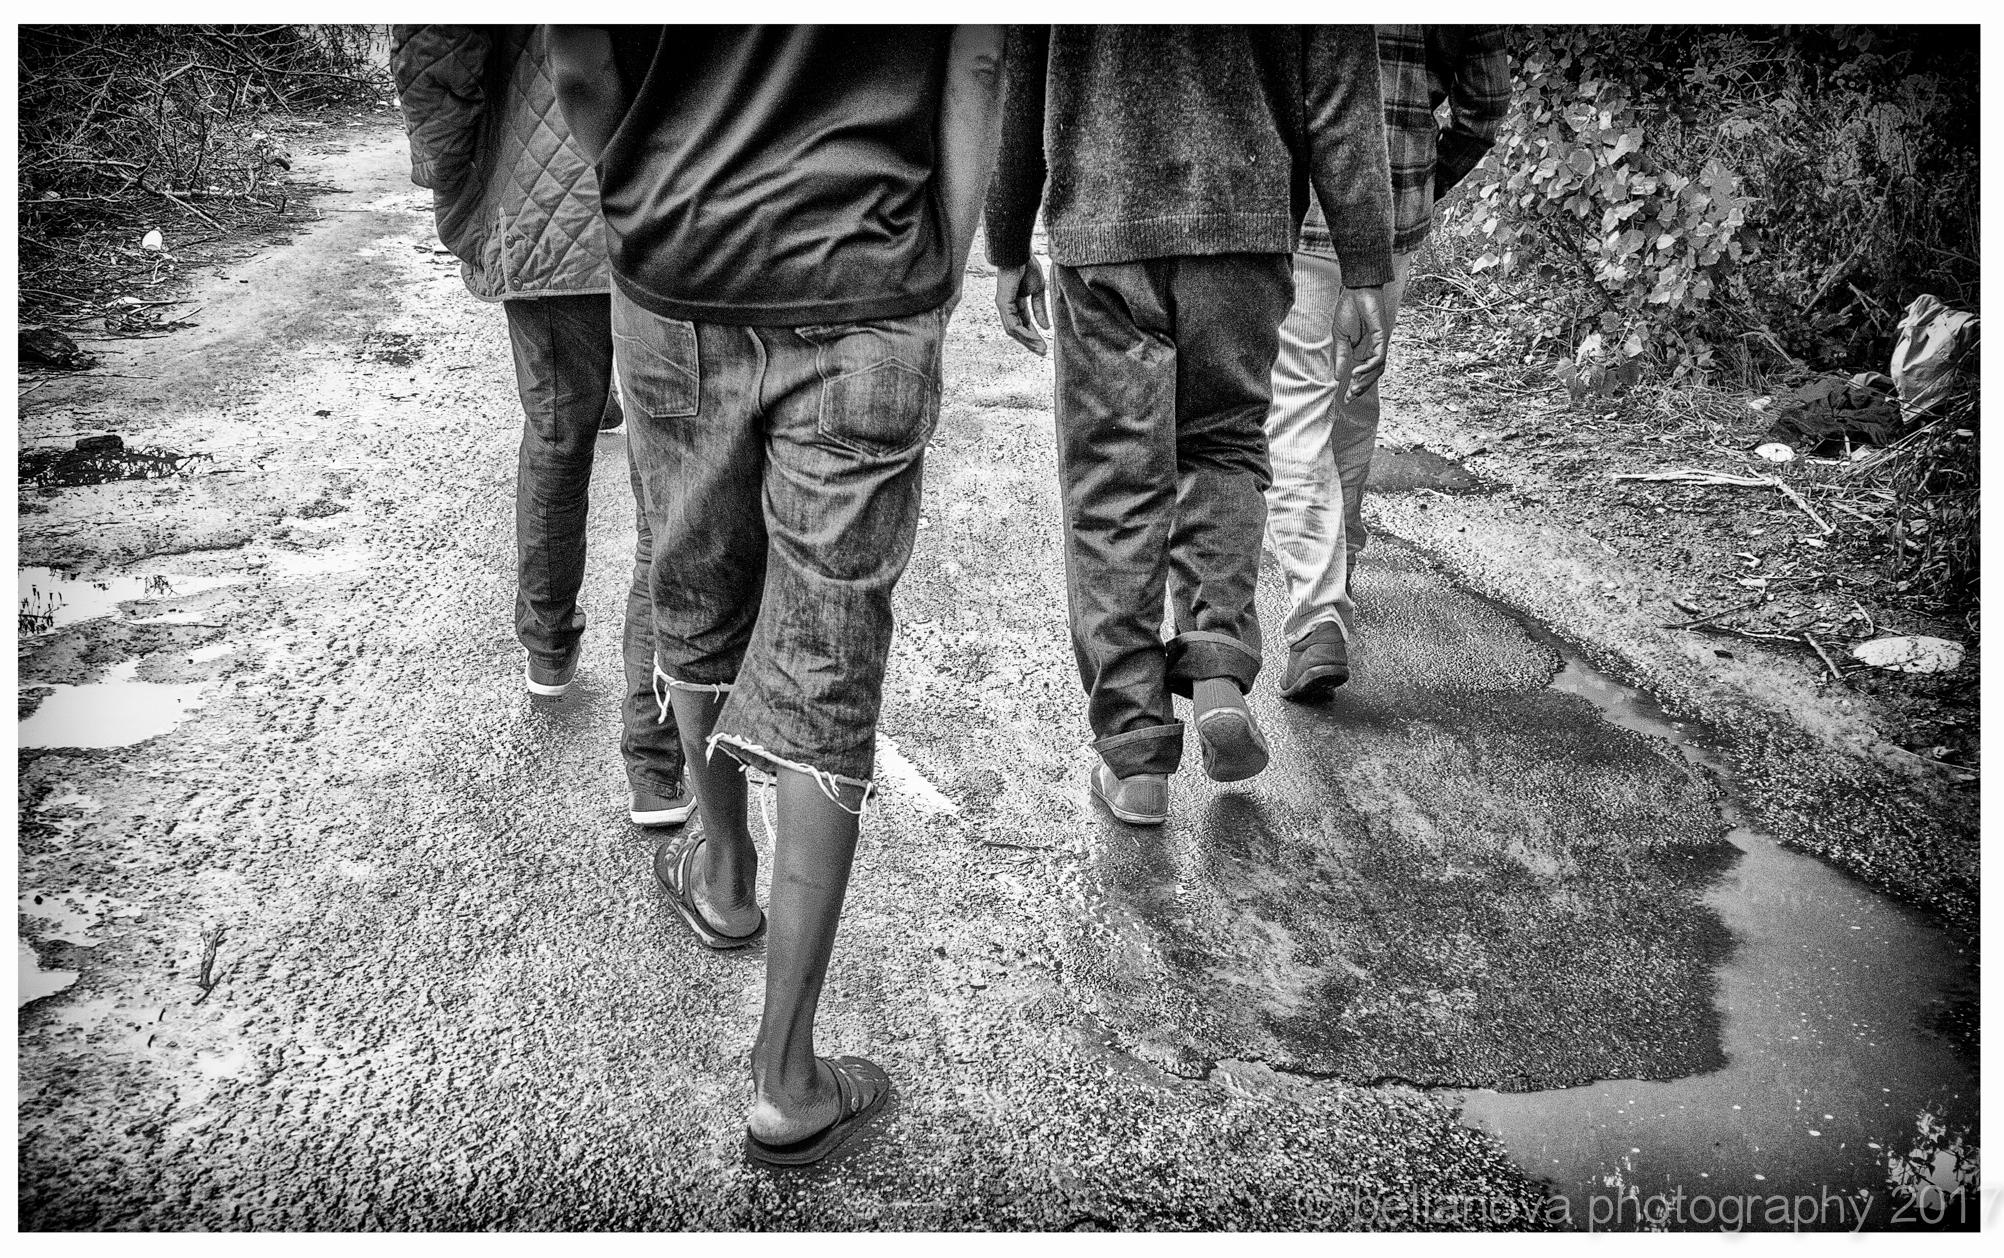 Refugees in Calais Jungle. France. Cassy Paris.jpg